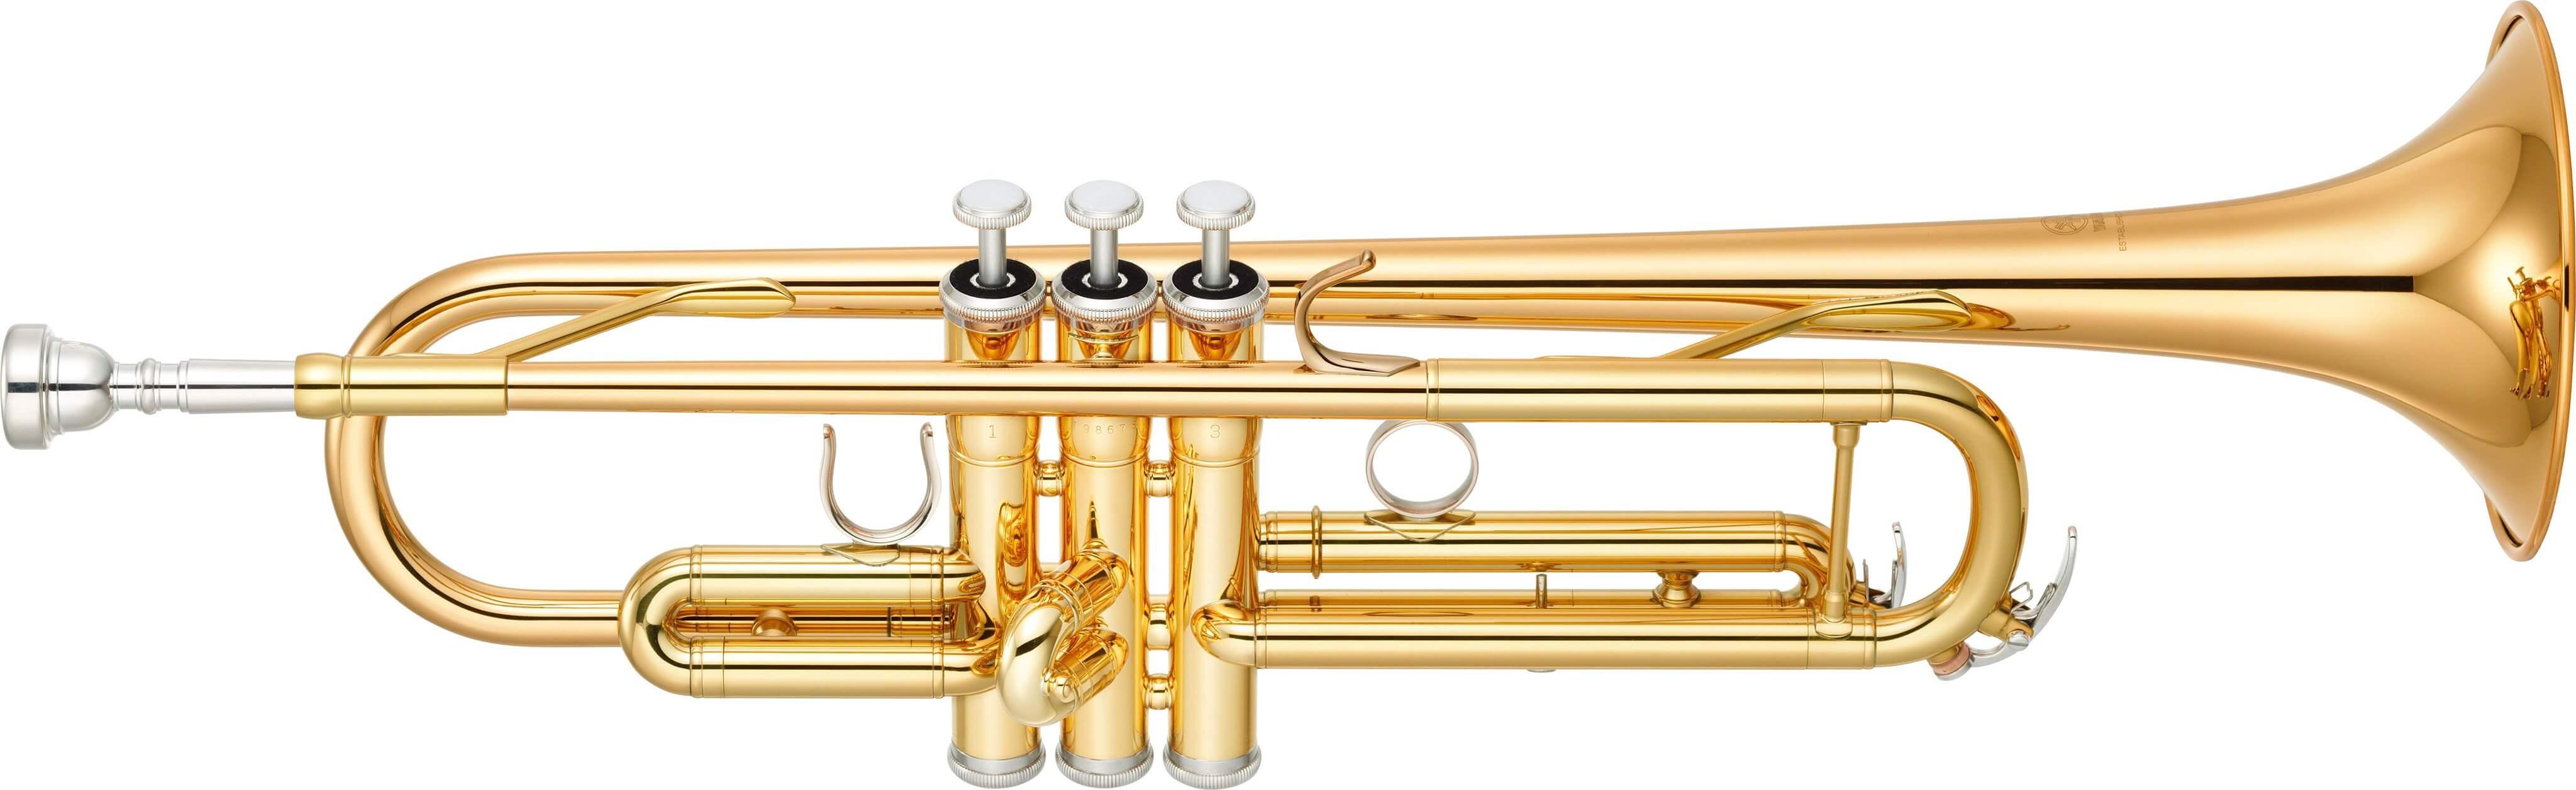 Trompeta Yamaha YTR-4335GII Lacada